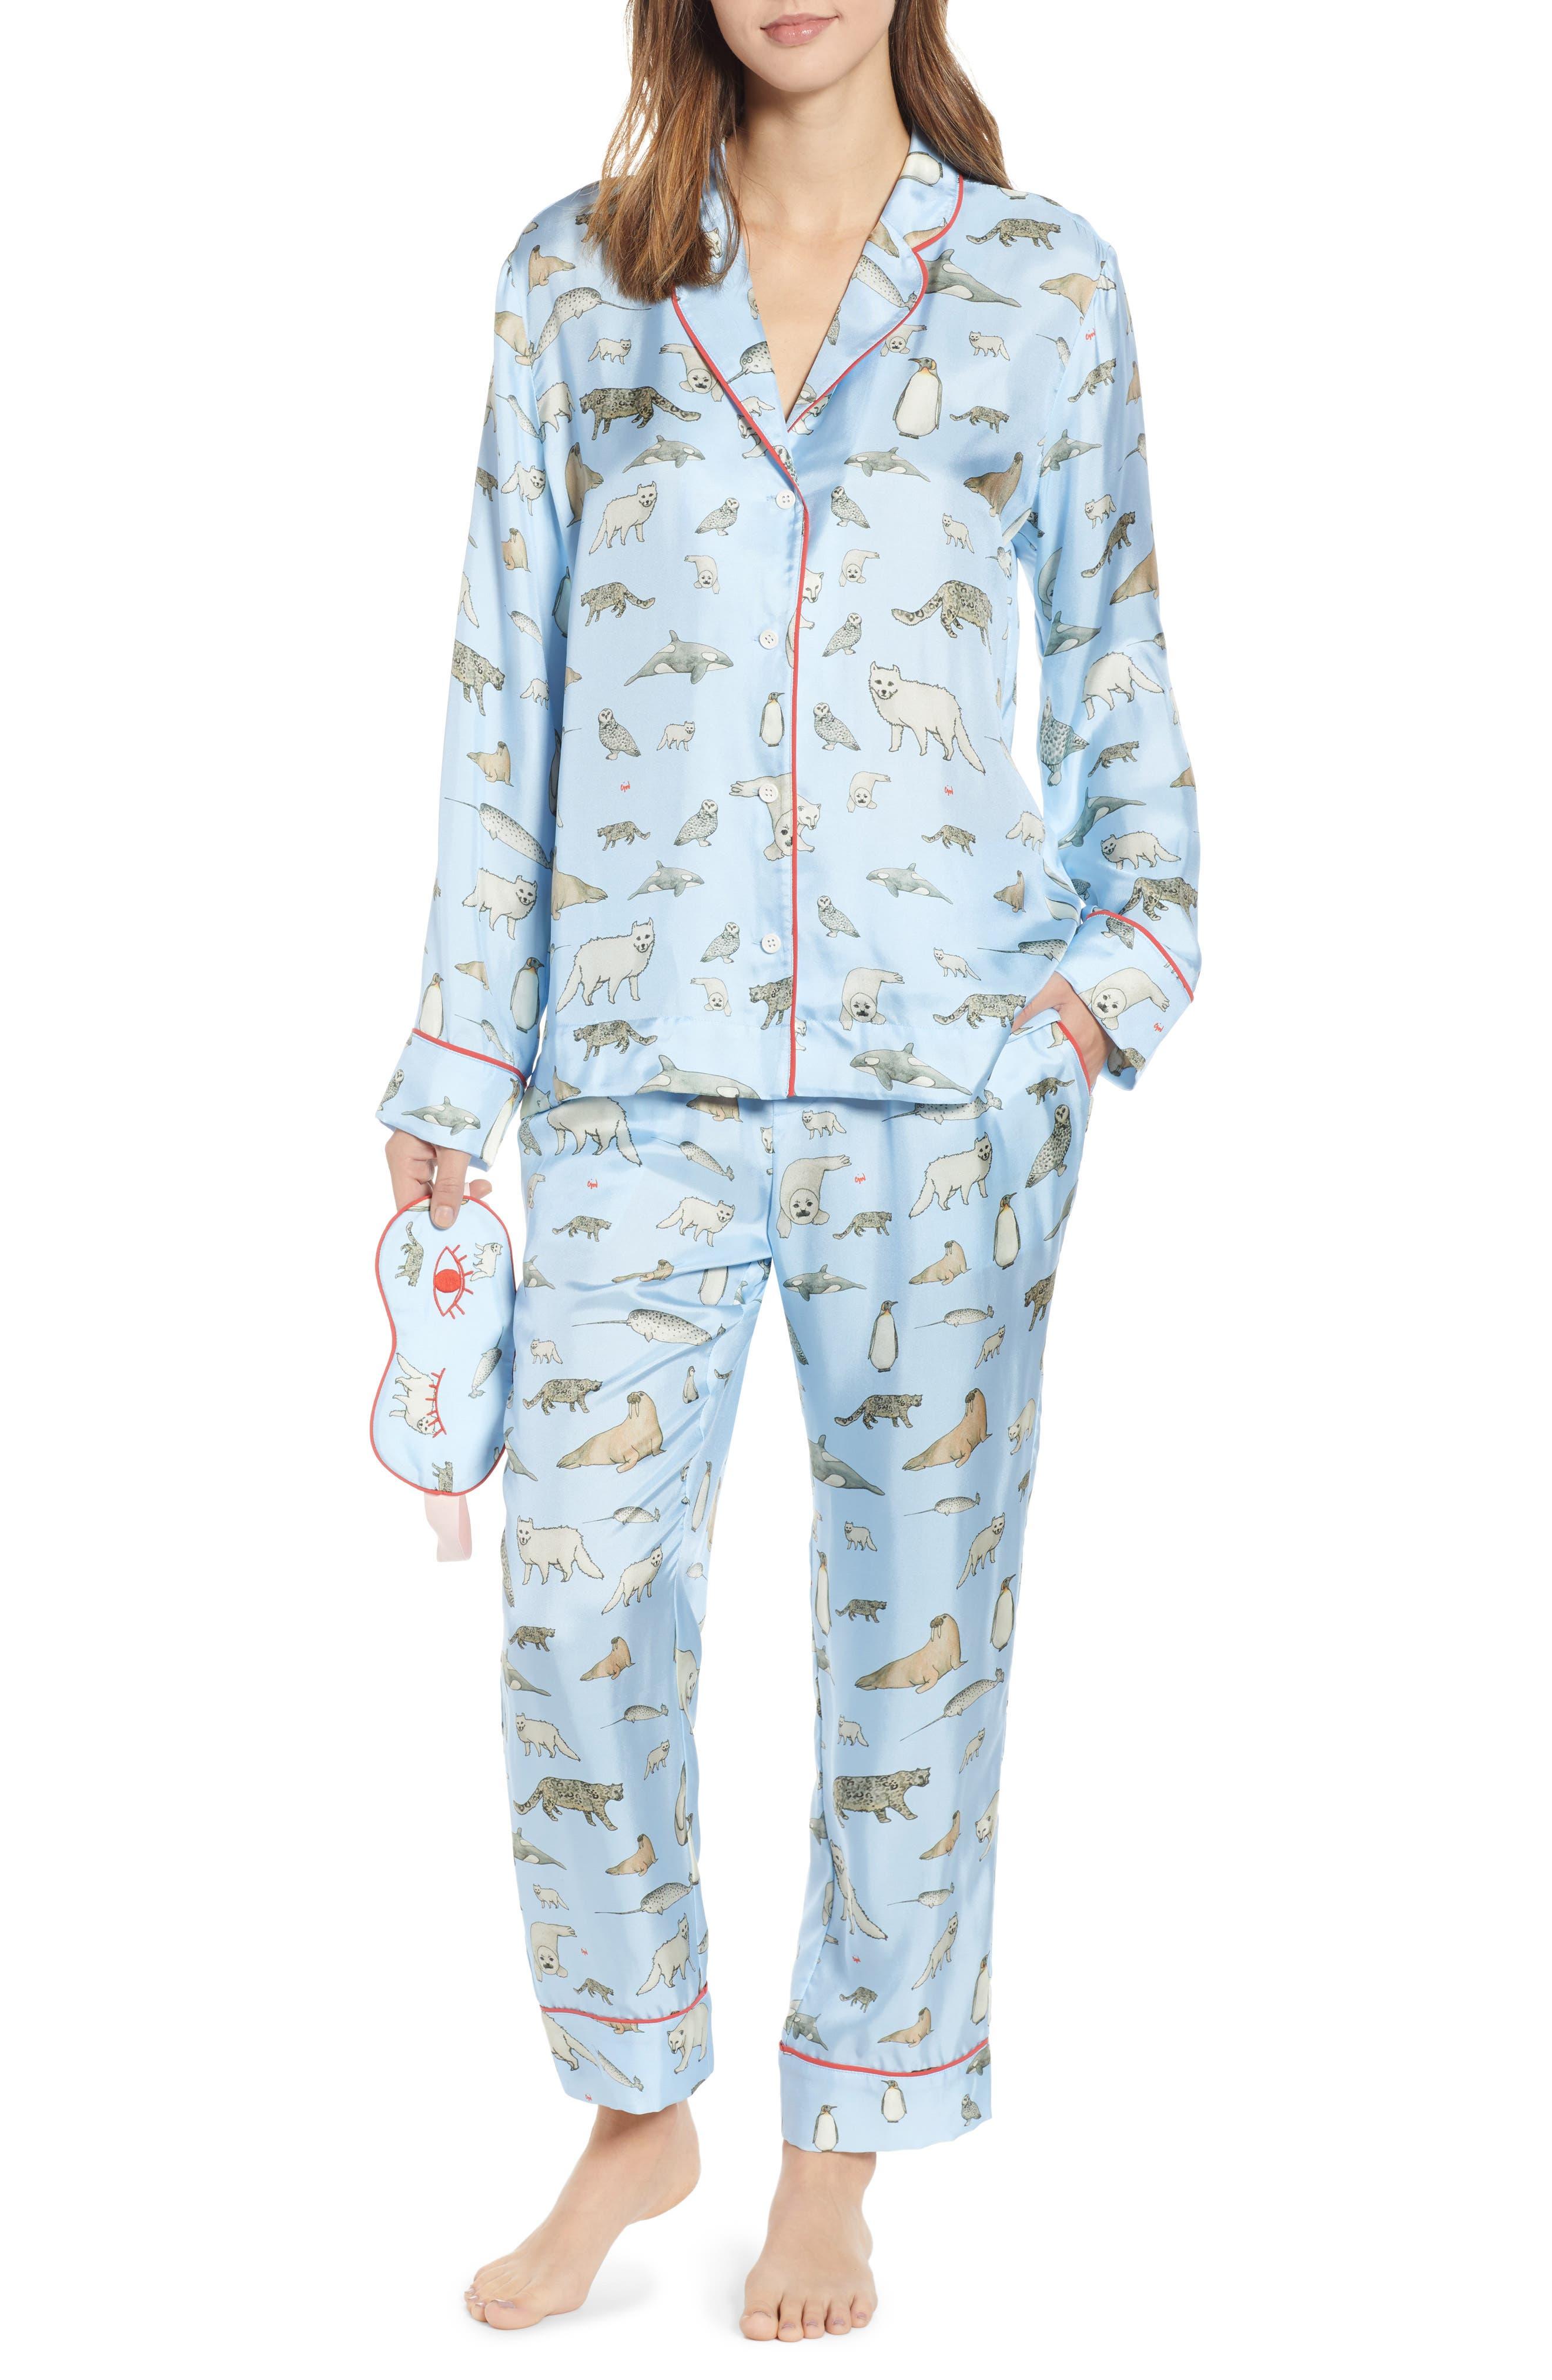 Winter Animals Pajamas & Eye Mask,                         Main,                         color, LIGHT BLUE